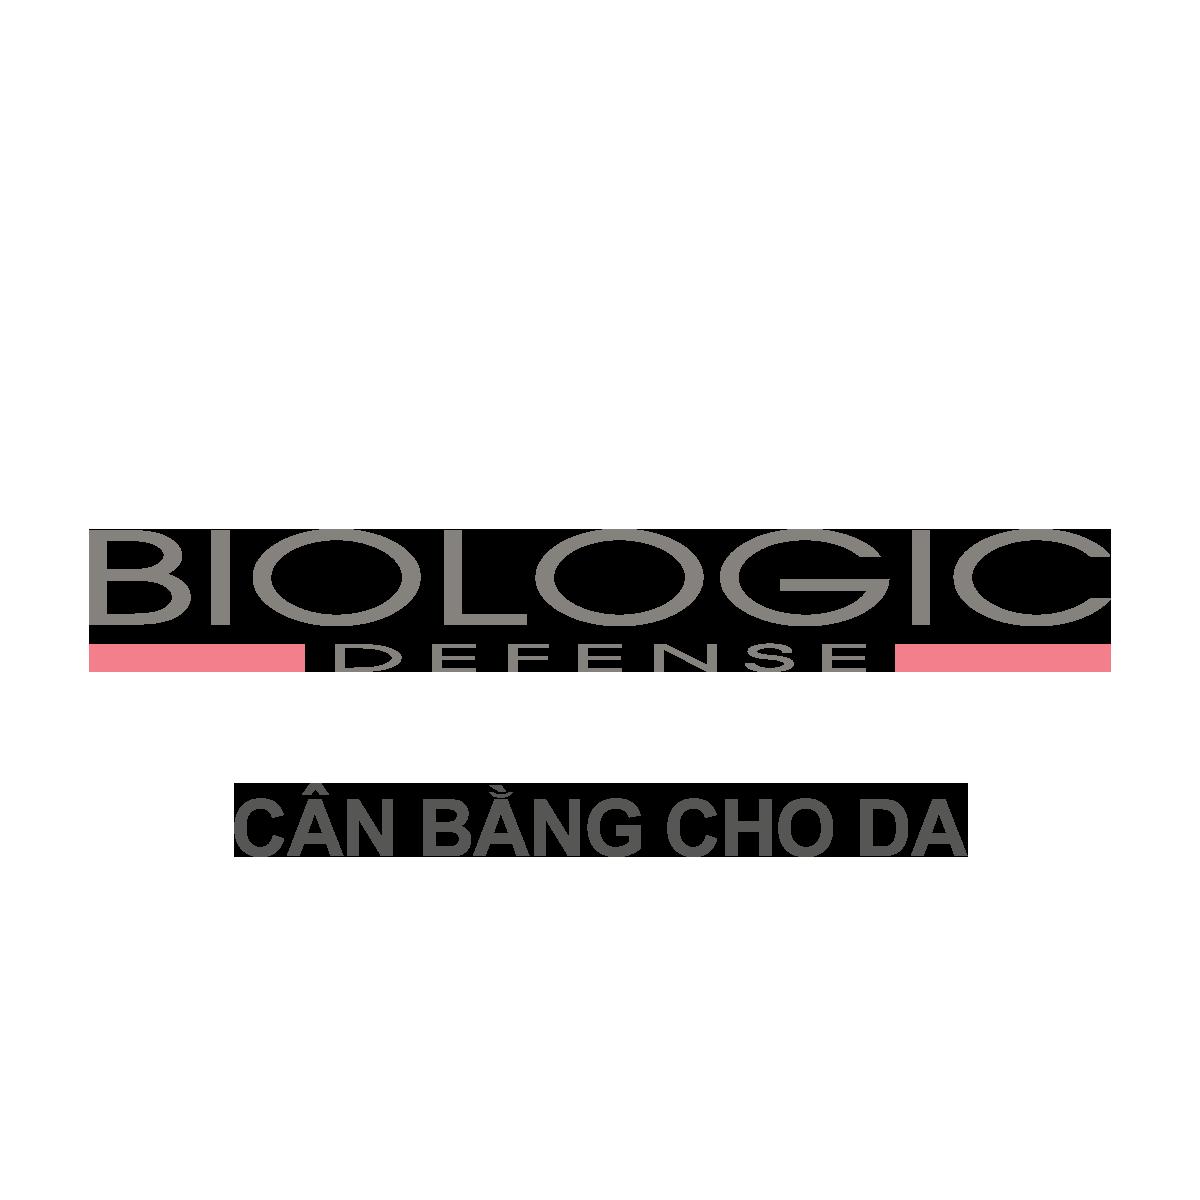 BIOLOGIC DEFENSE